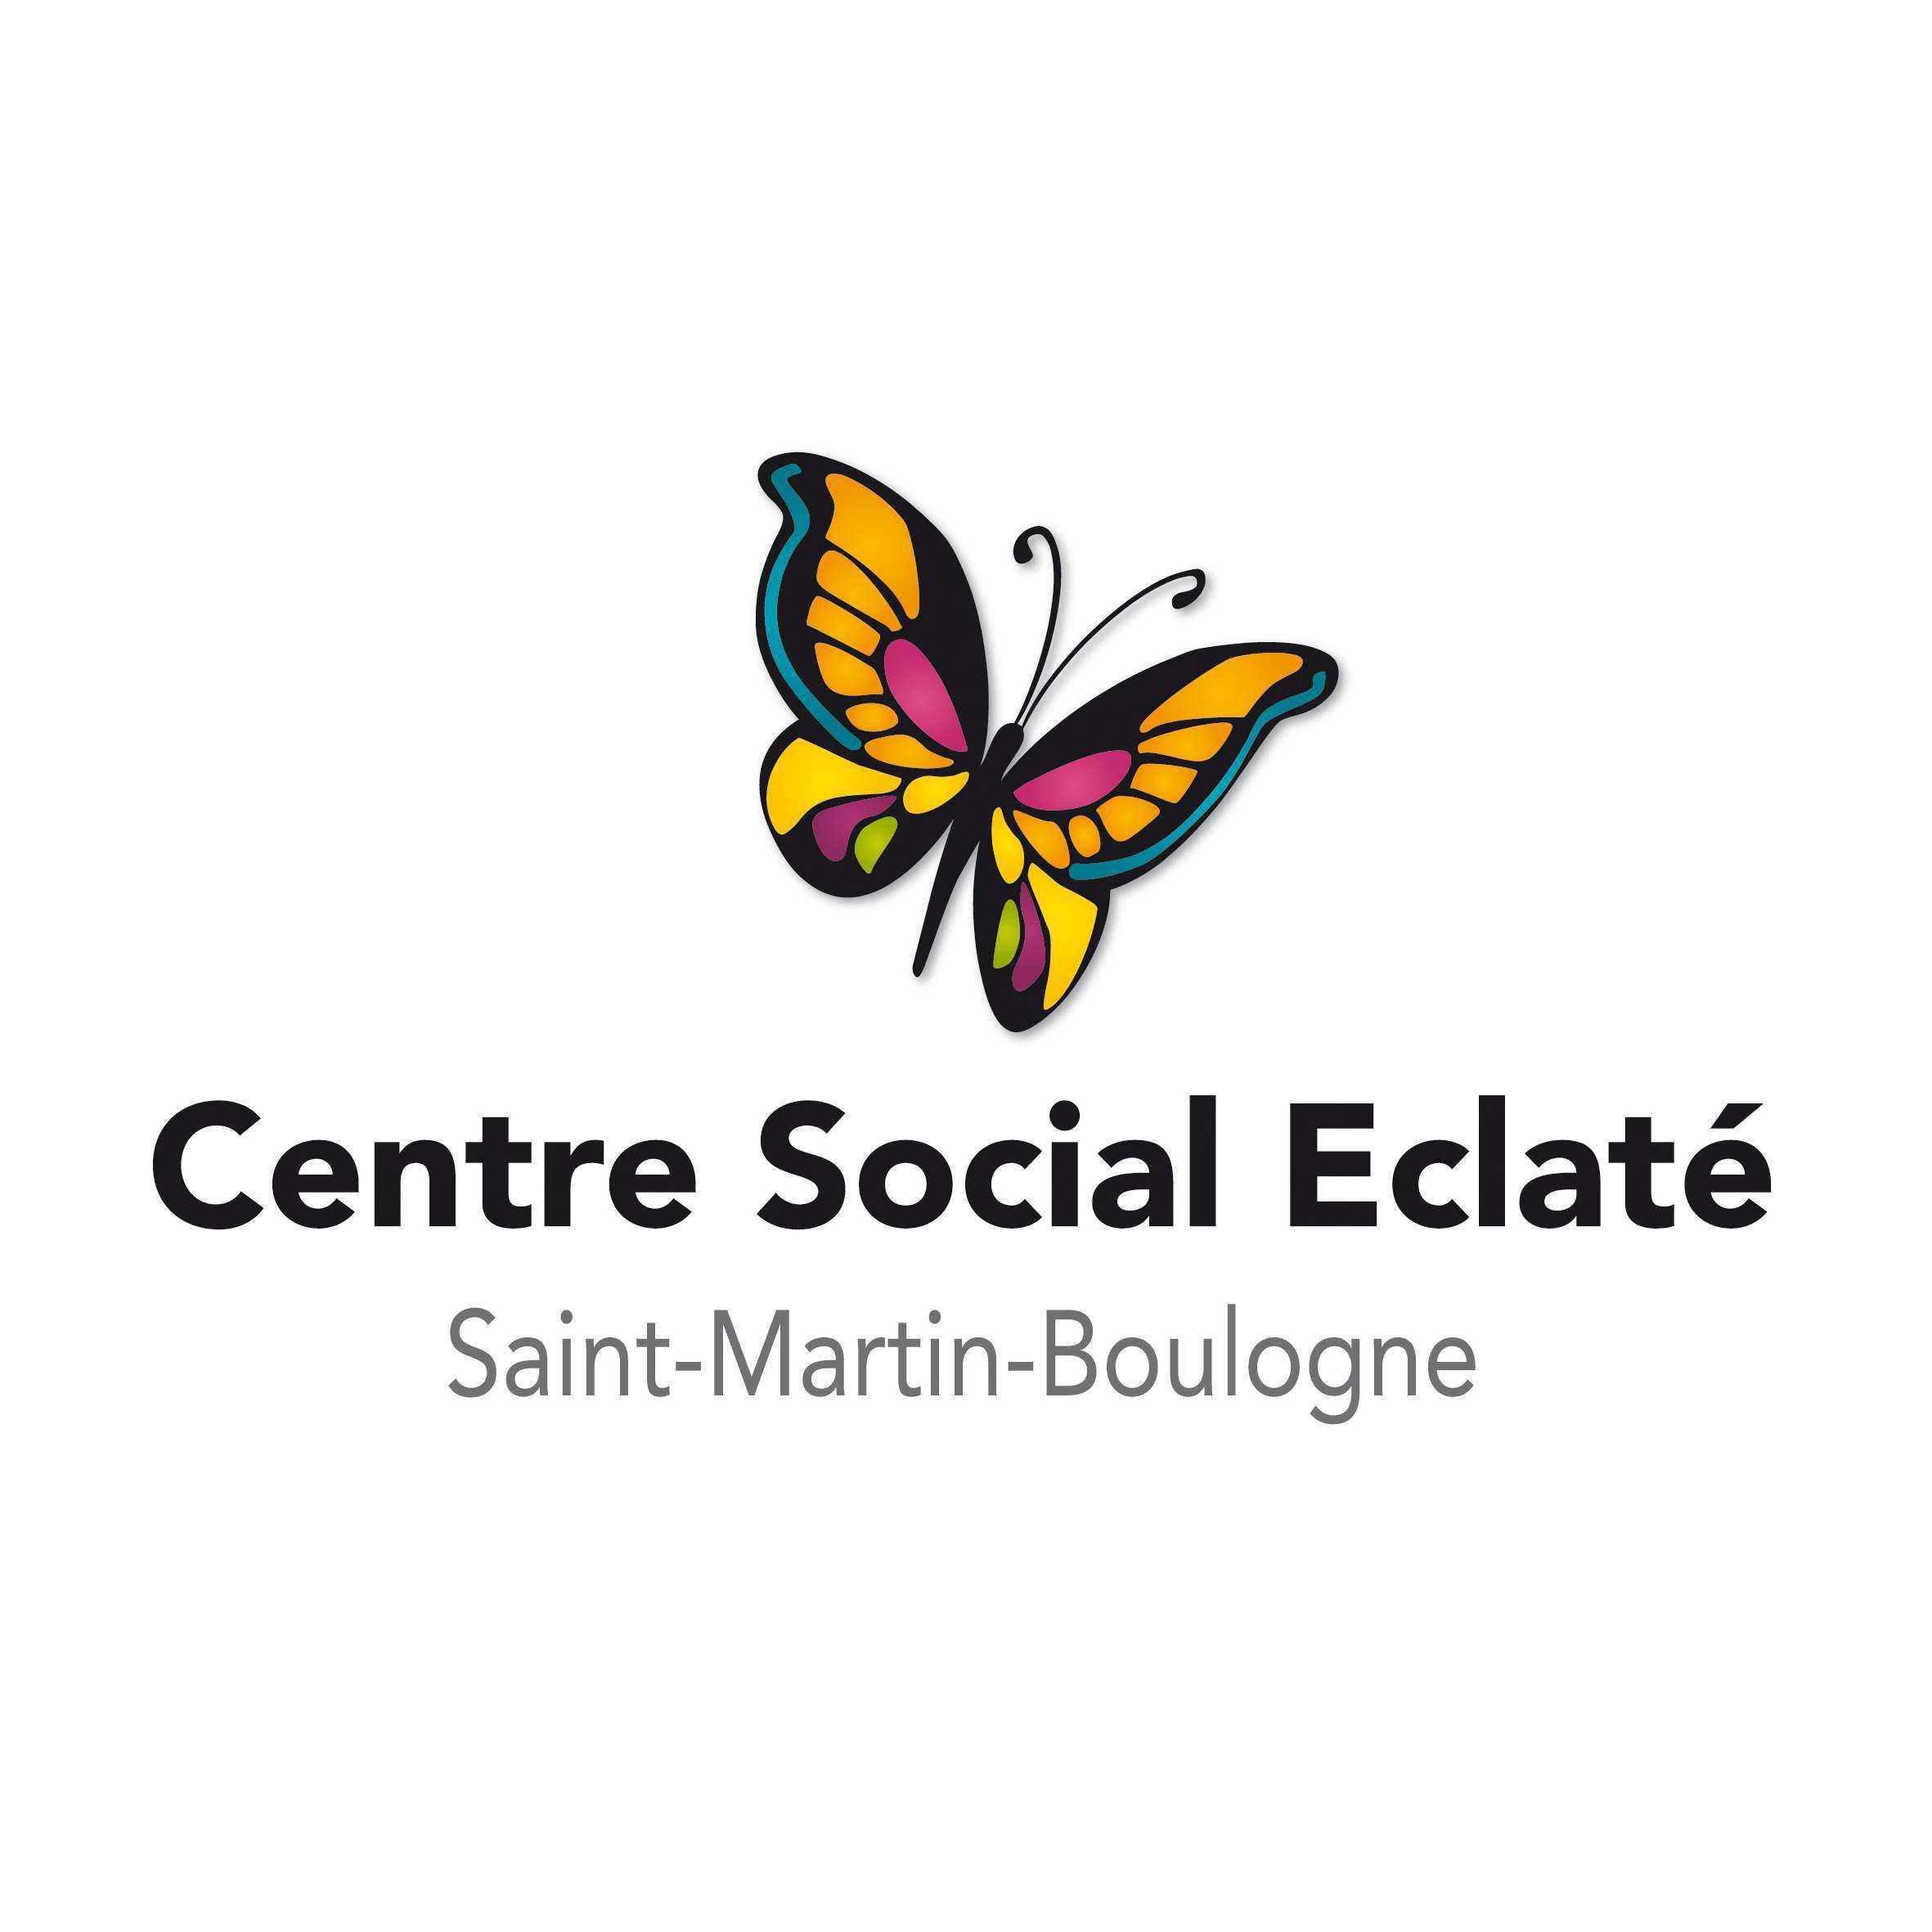 centresocialeclate.centres-sociaux.fr/files/2016/01/saint-martin-boulogne-centre-social-eclate-941